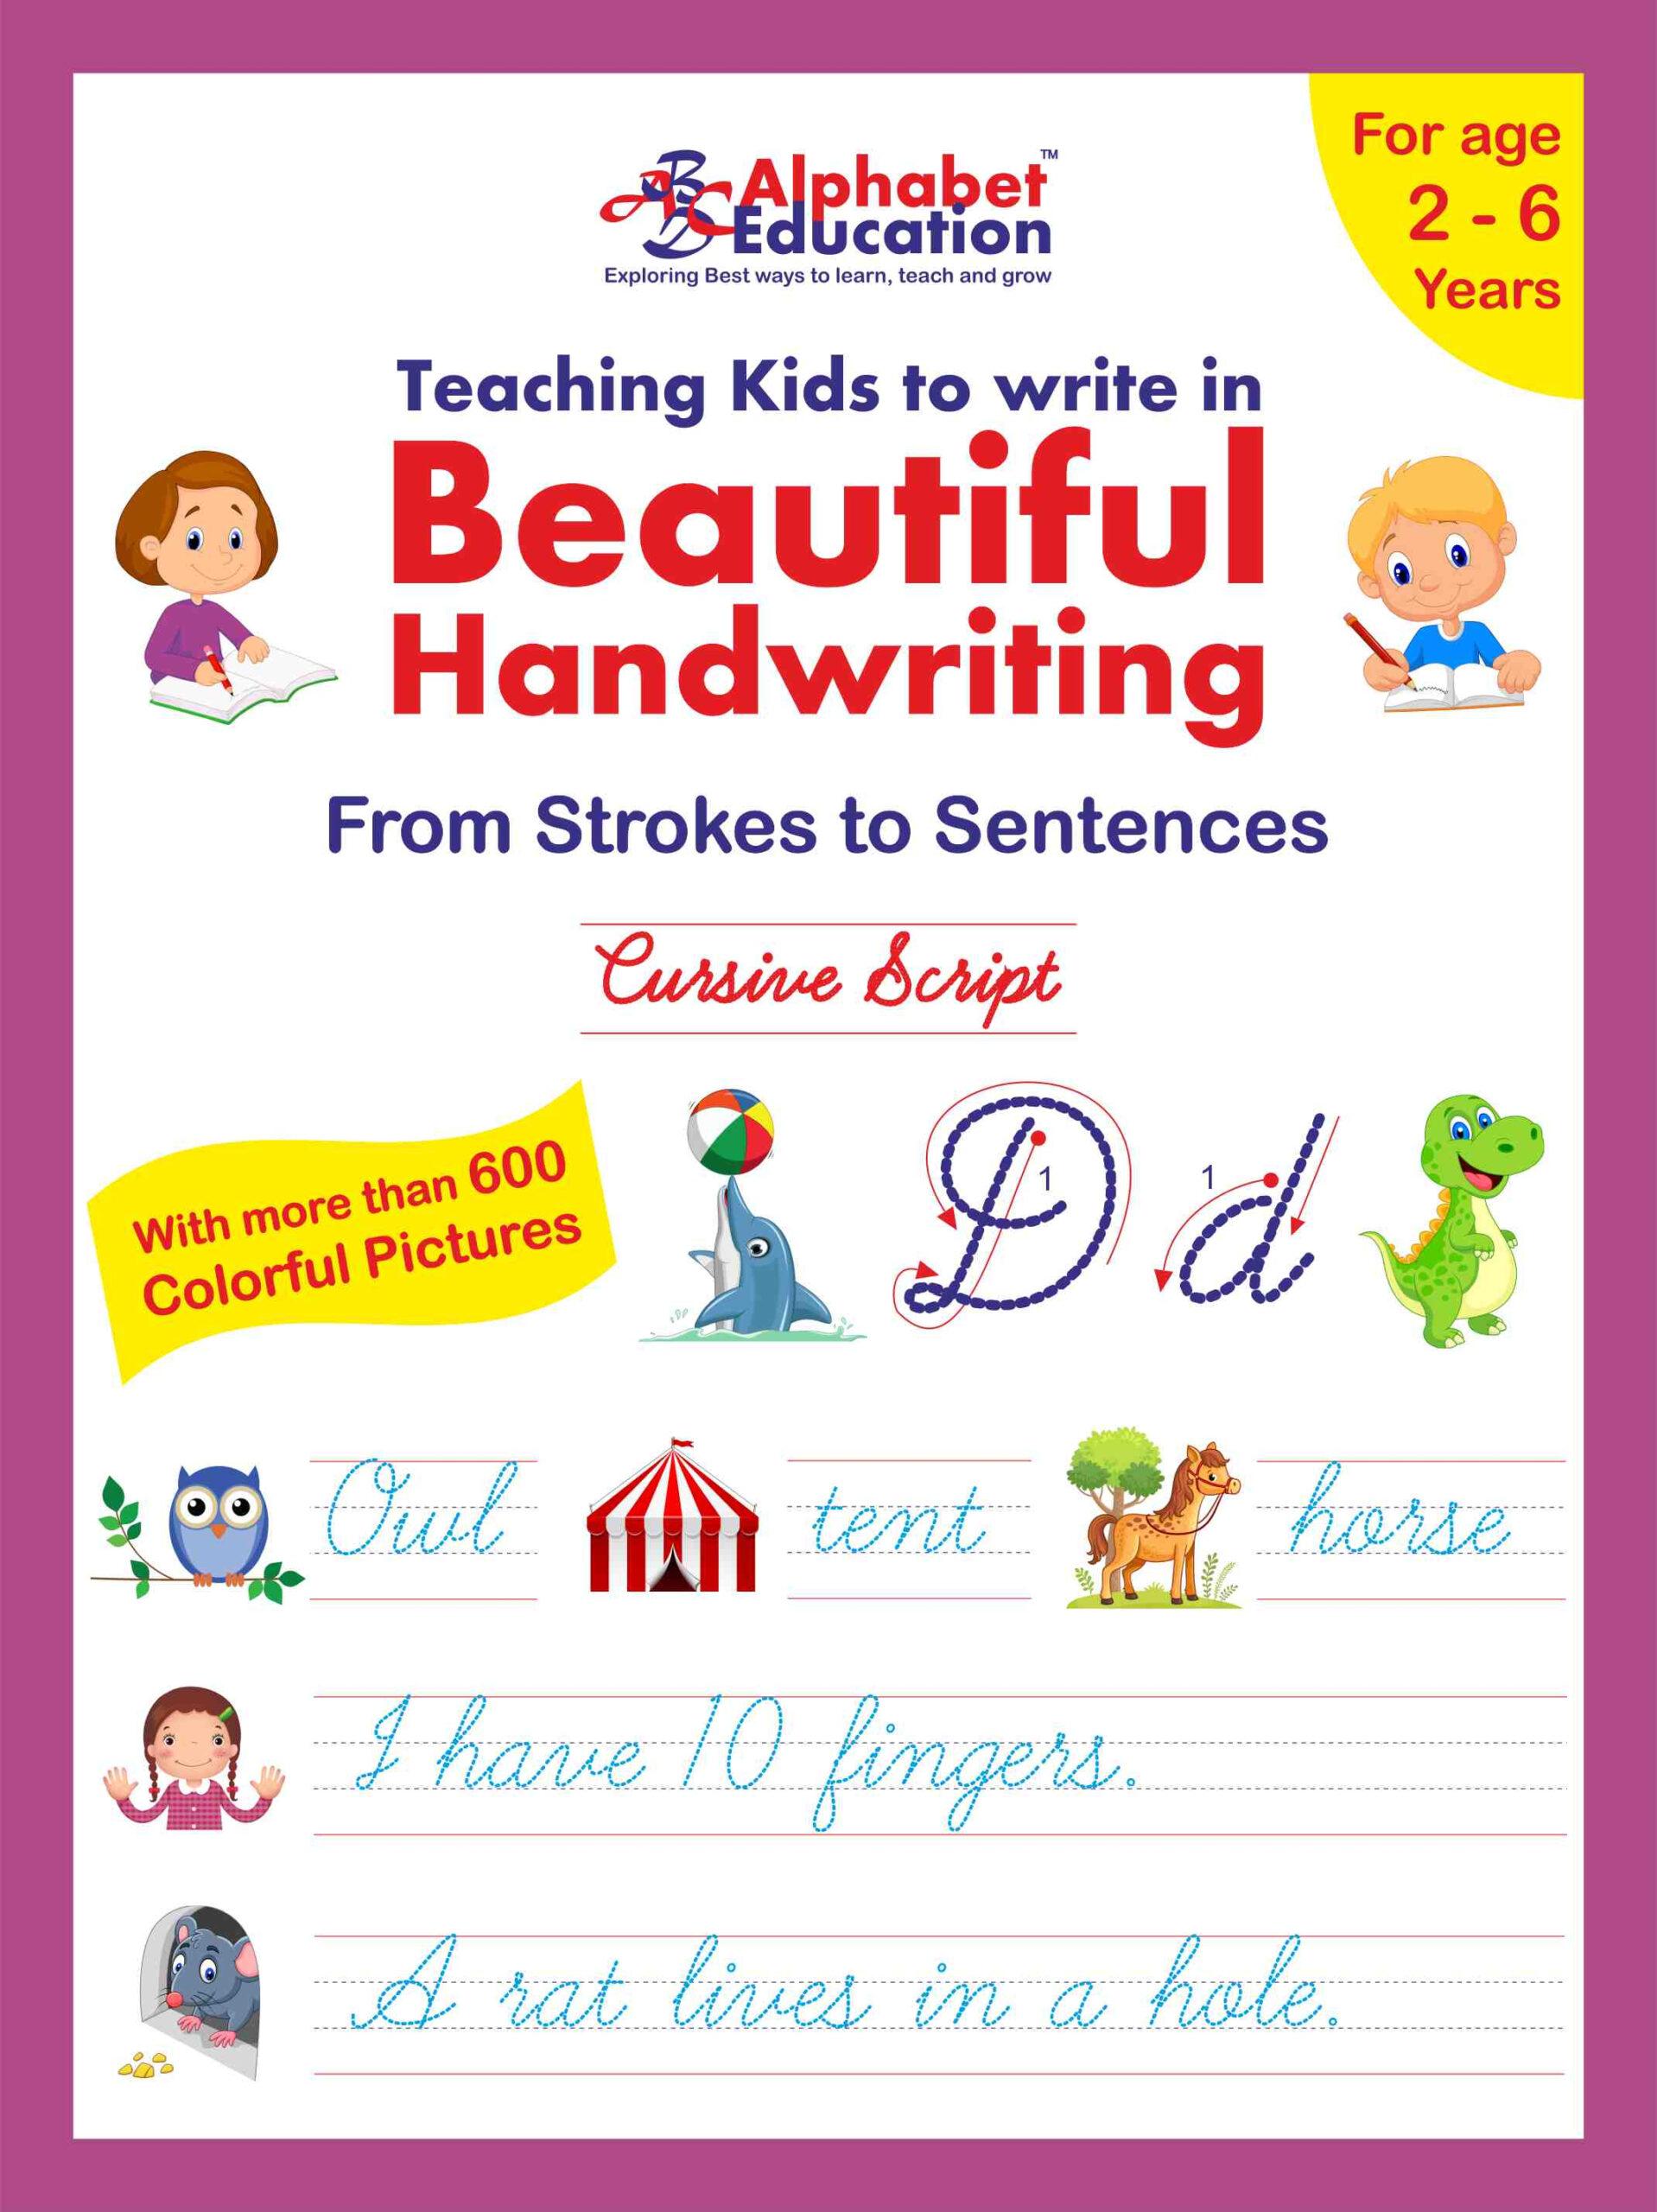 Teaching Kids To Write In Beautiful Handwriting – Cursive Script (For Age  2-6 Years)